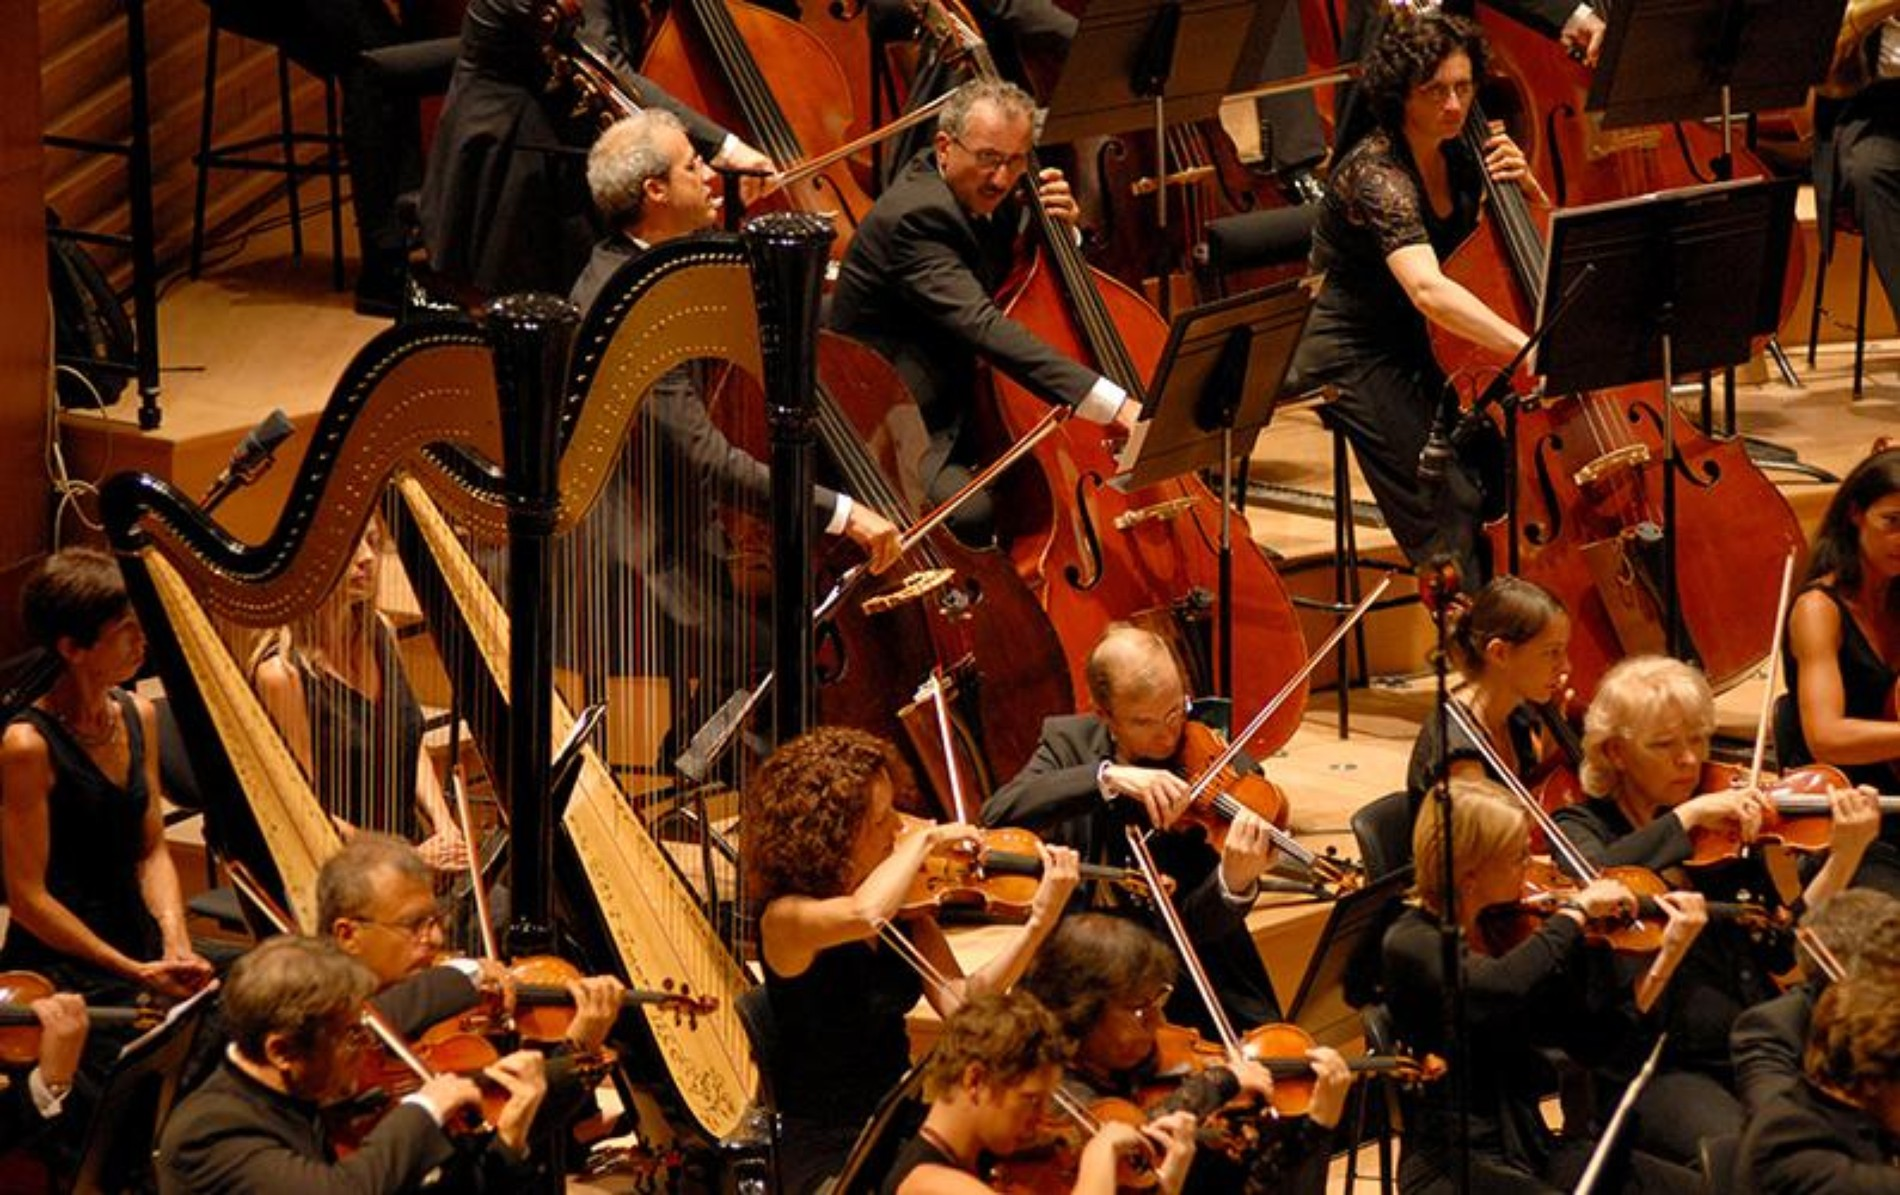 Empresa de Música clásica, Ópera y Coros en Girona Dani Gual Guitar